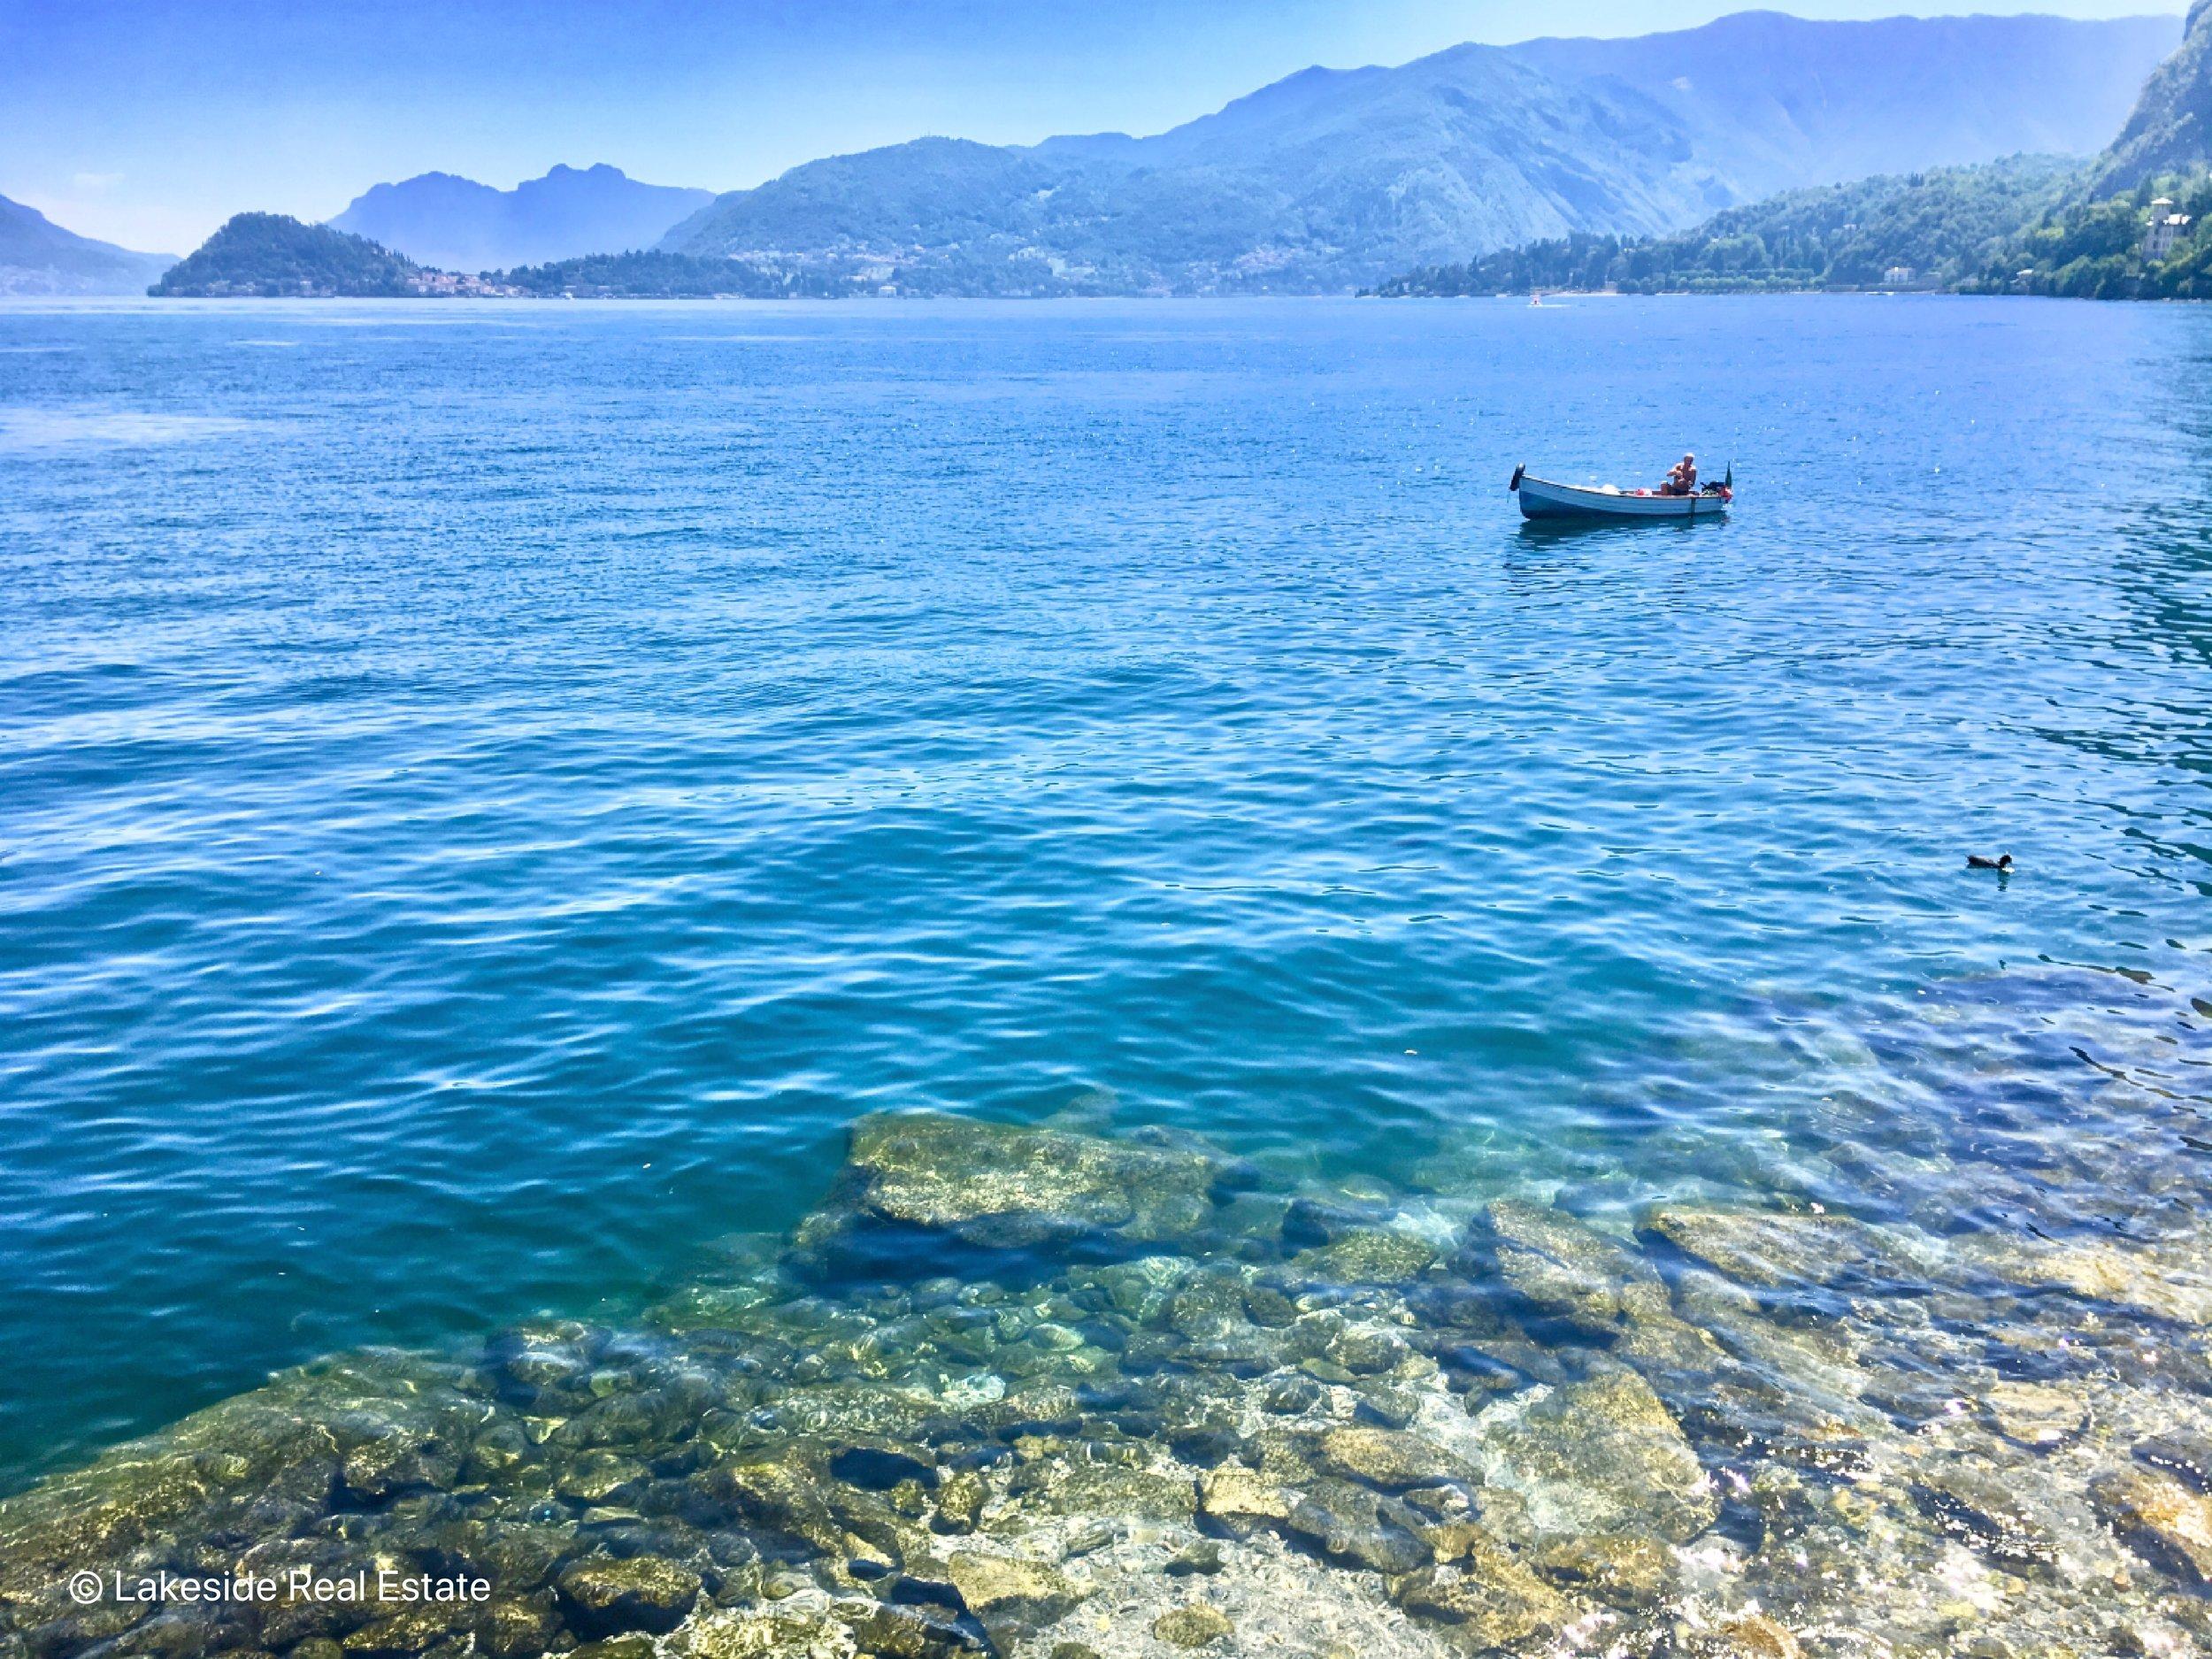 An ordinary summer day in Menaggio, Lake Como